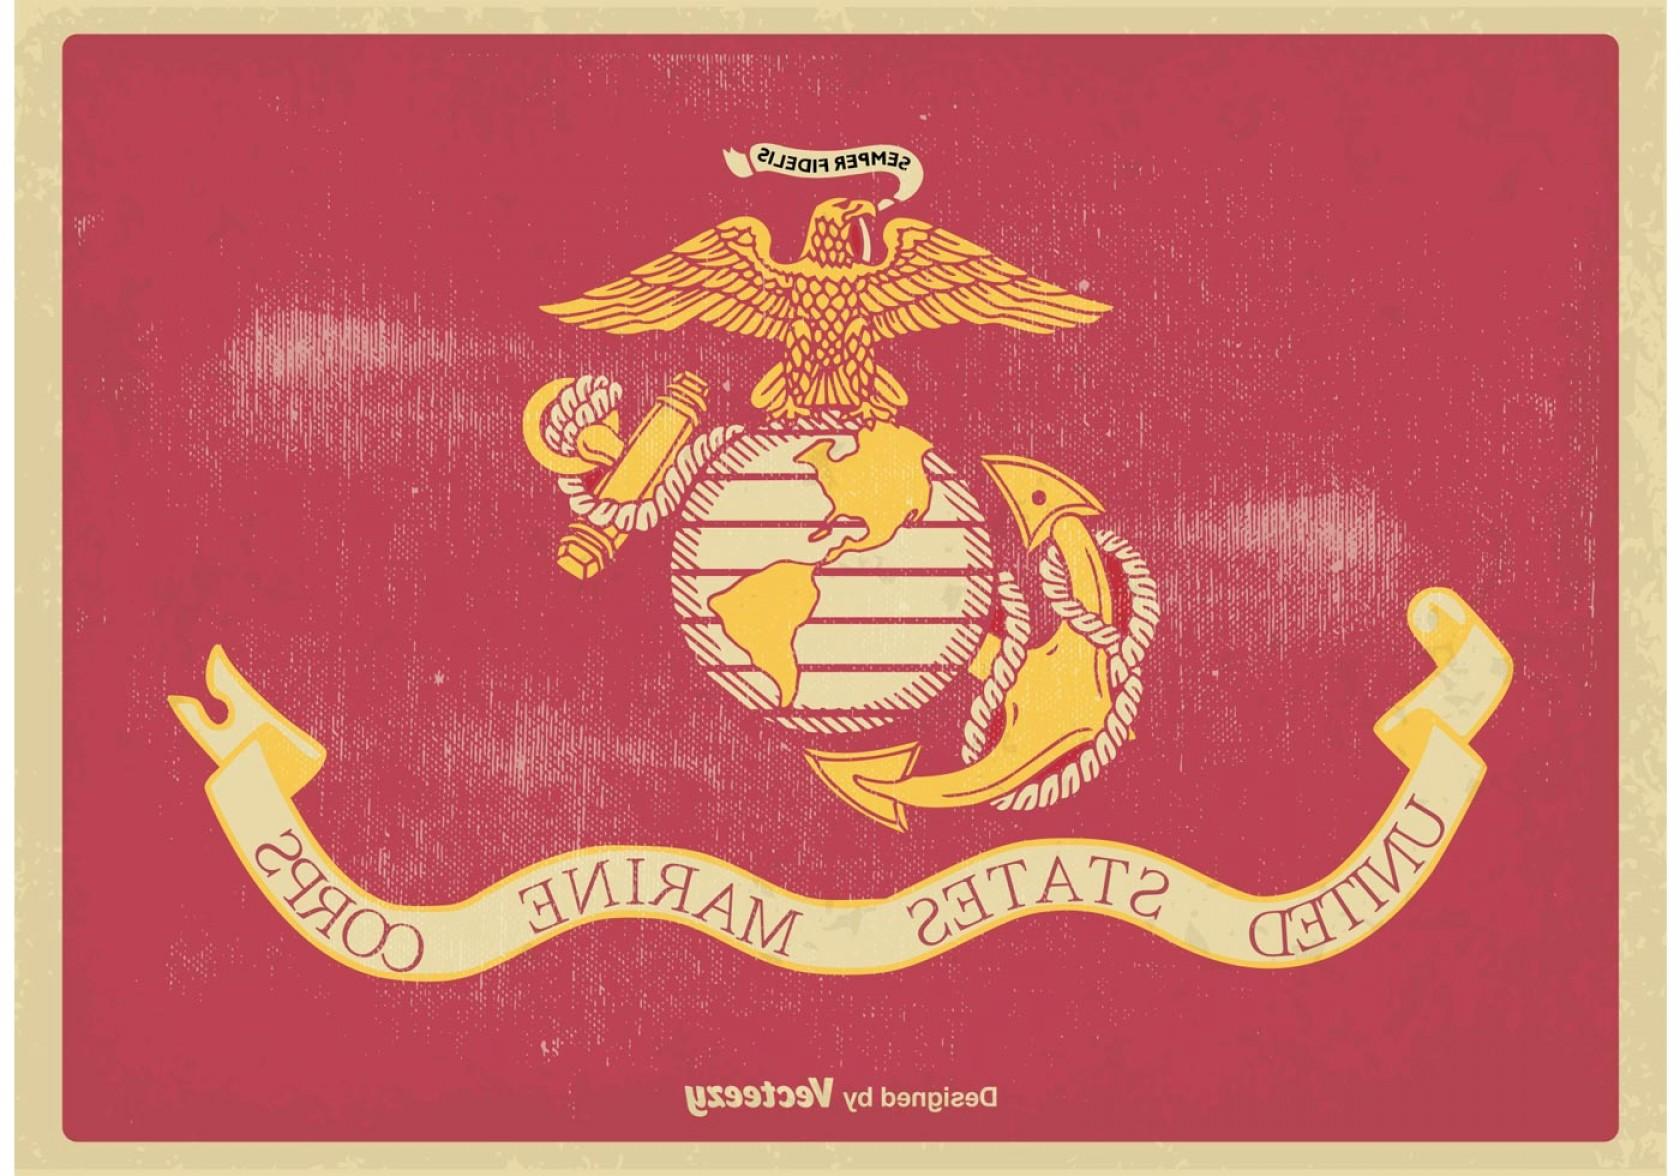 1680x1176 Us Marine Corps Flag Vector Illustration Arenawp